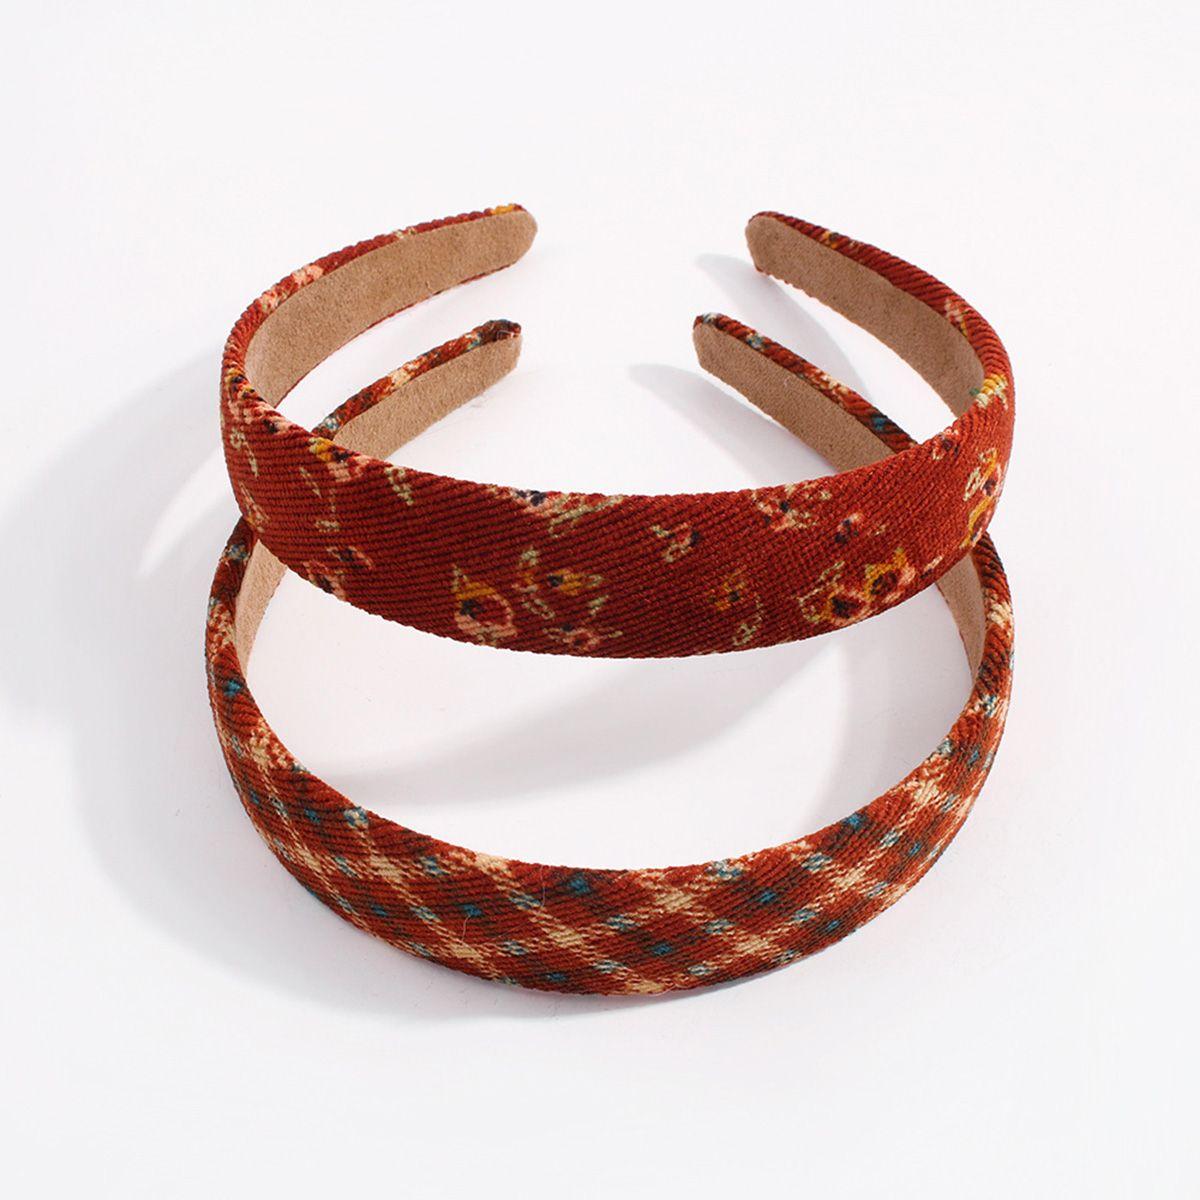 ookjewelry wholesale Retro Plaid & Flower Corduroy Headbands